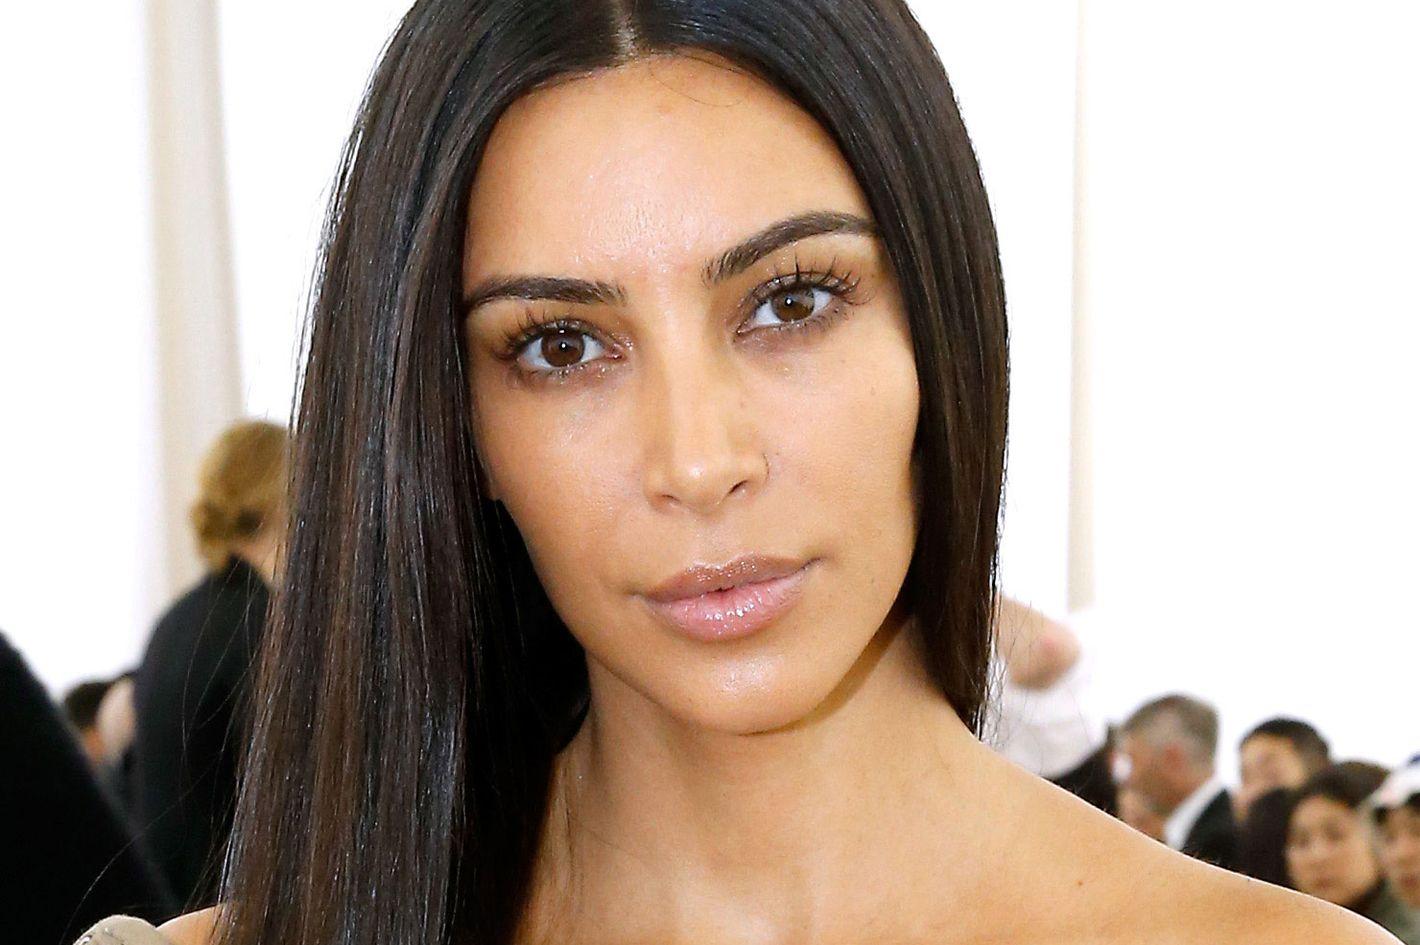 Forum on this topic: Kim Kardashian Goes Makeup Free for the , kim-kardashian-goes-makeup-free-for-the/